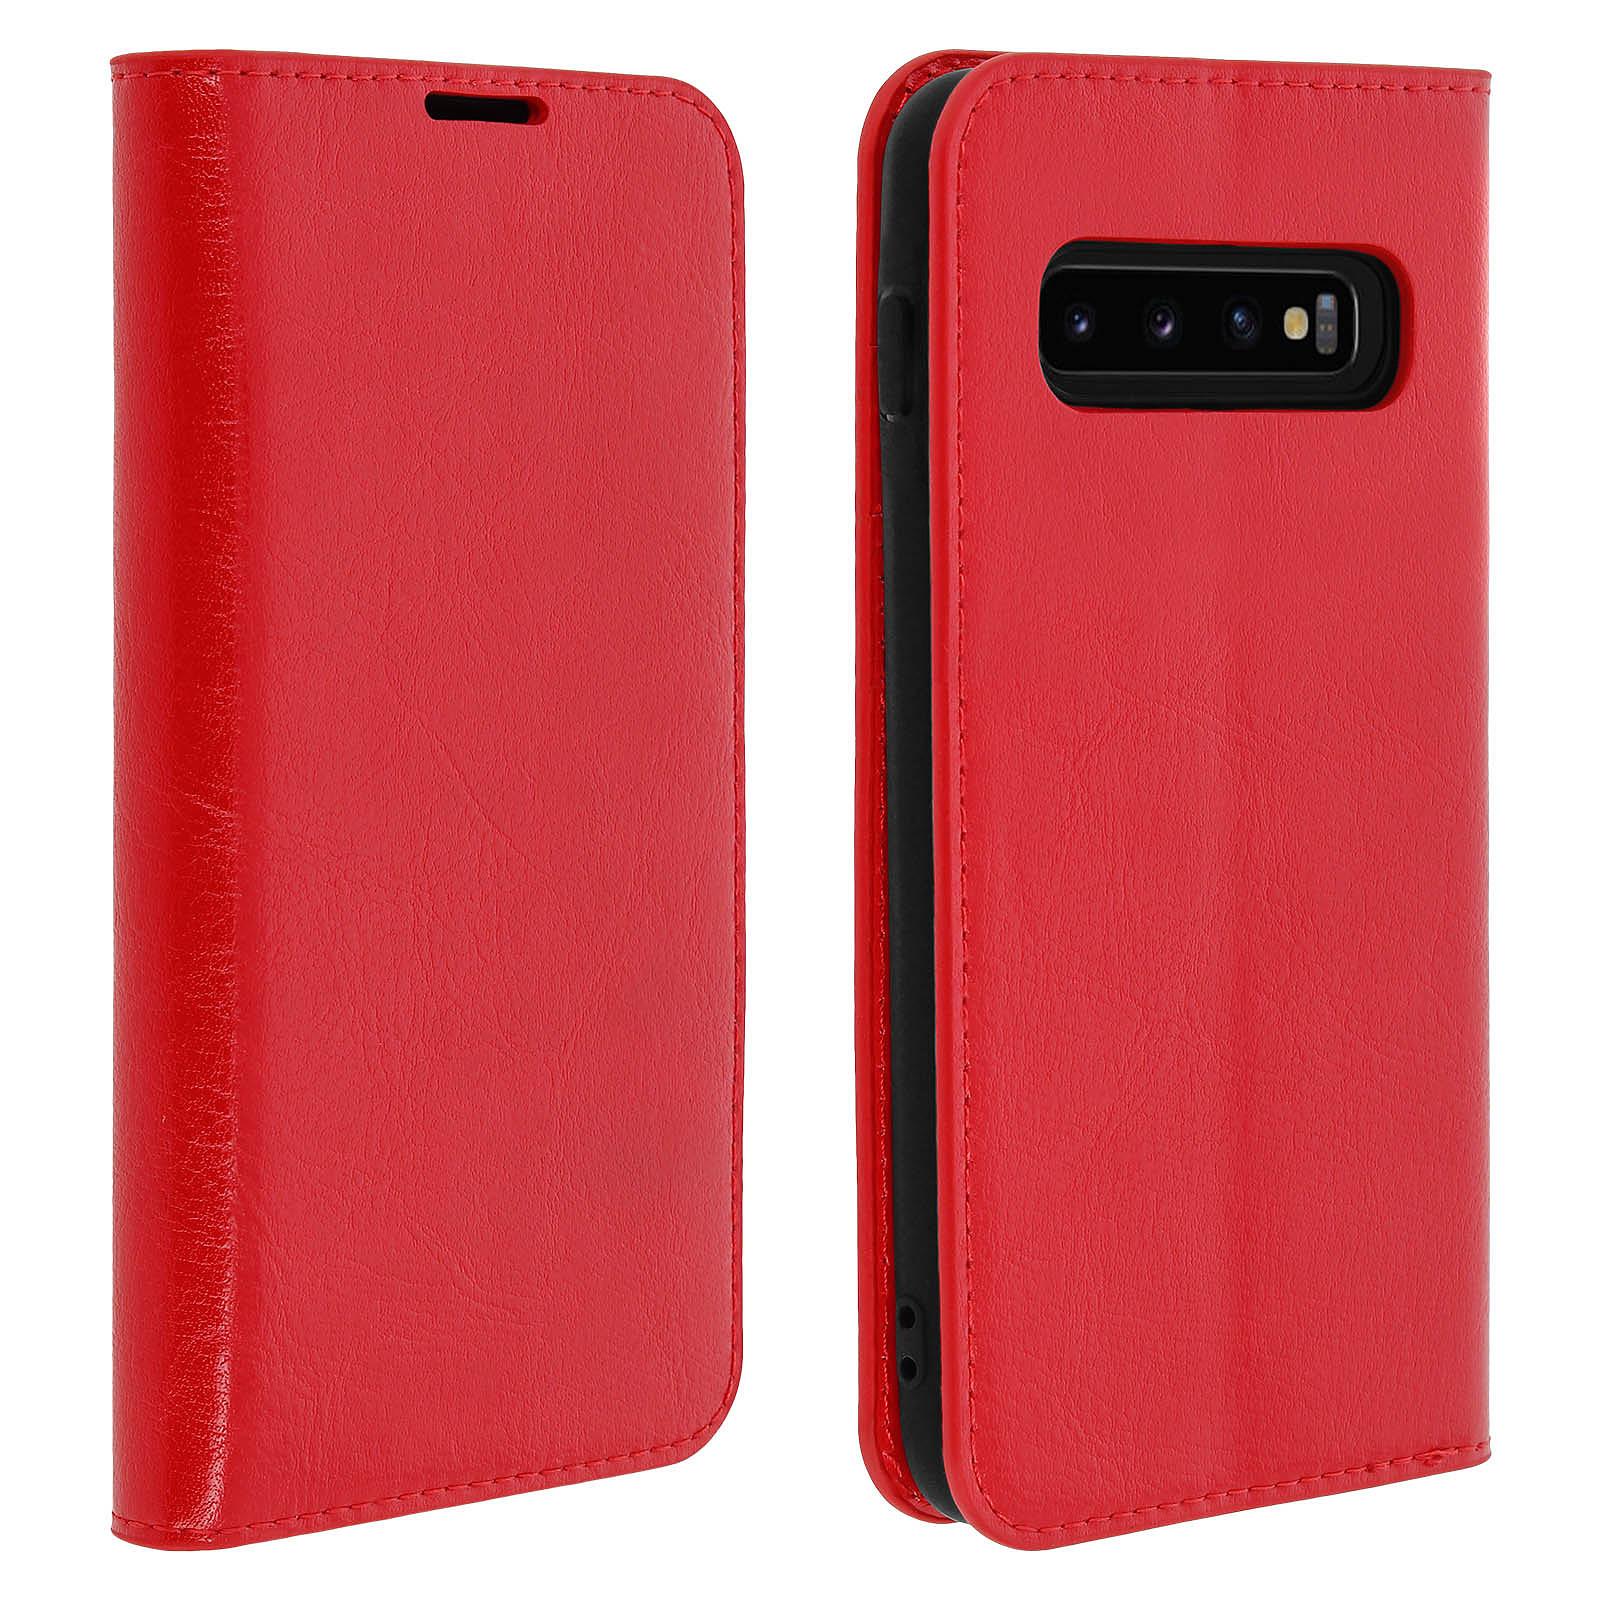 Avizar Etui folio Rouge pour Samsung Galaxy S10 Plus